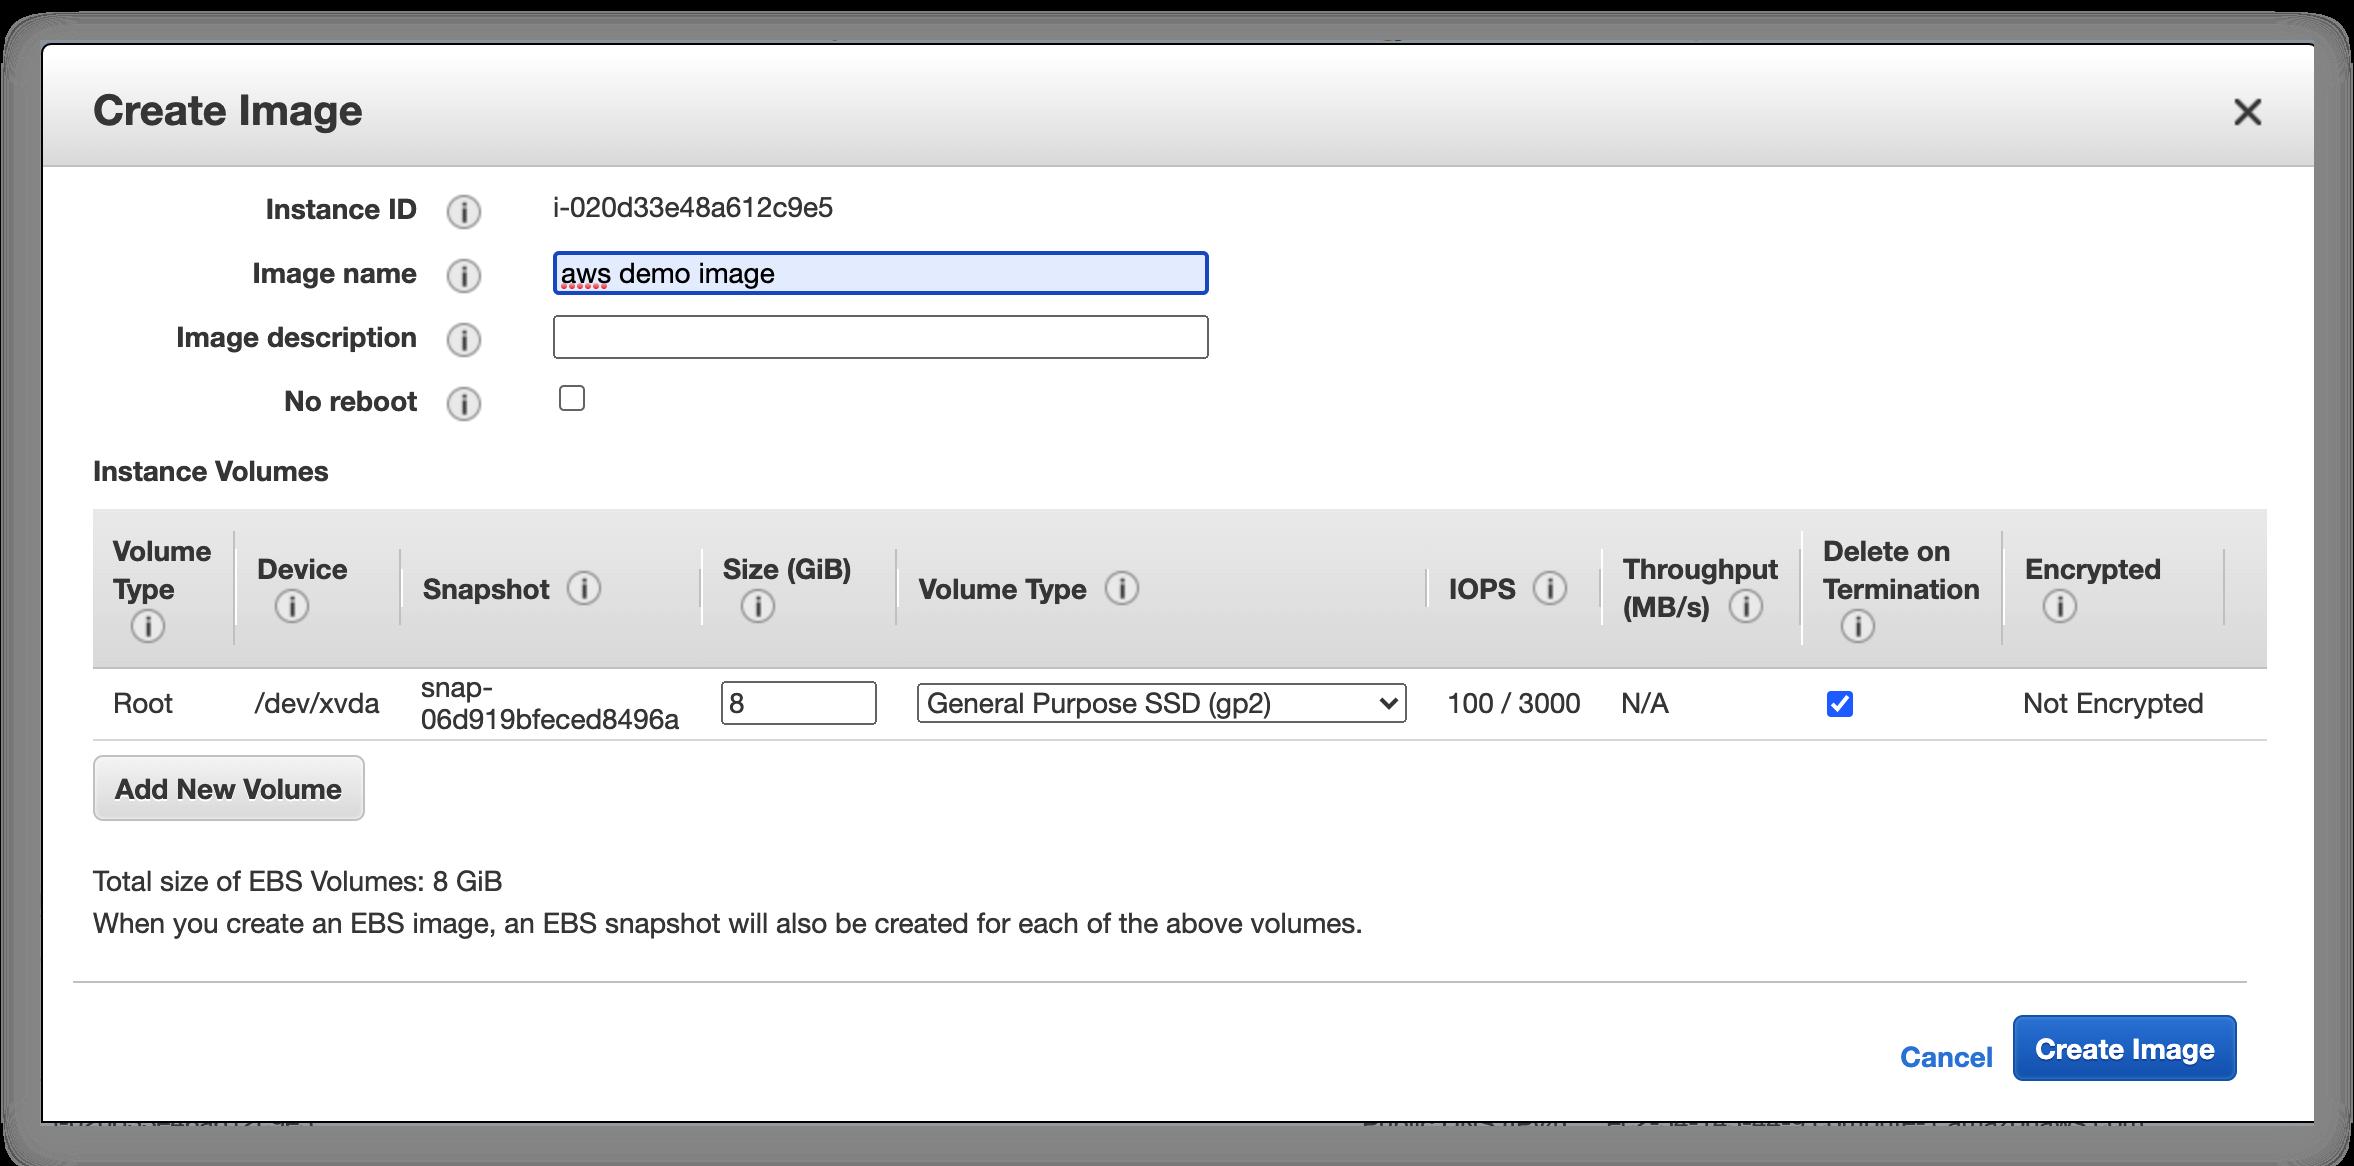 【AWS征文】使用 AWS EC2 安装 Apache 服务